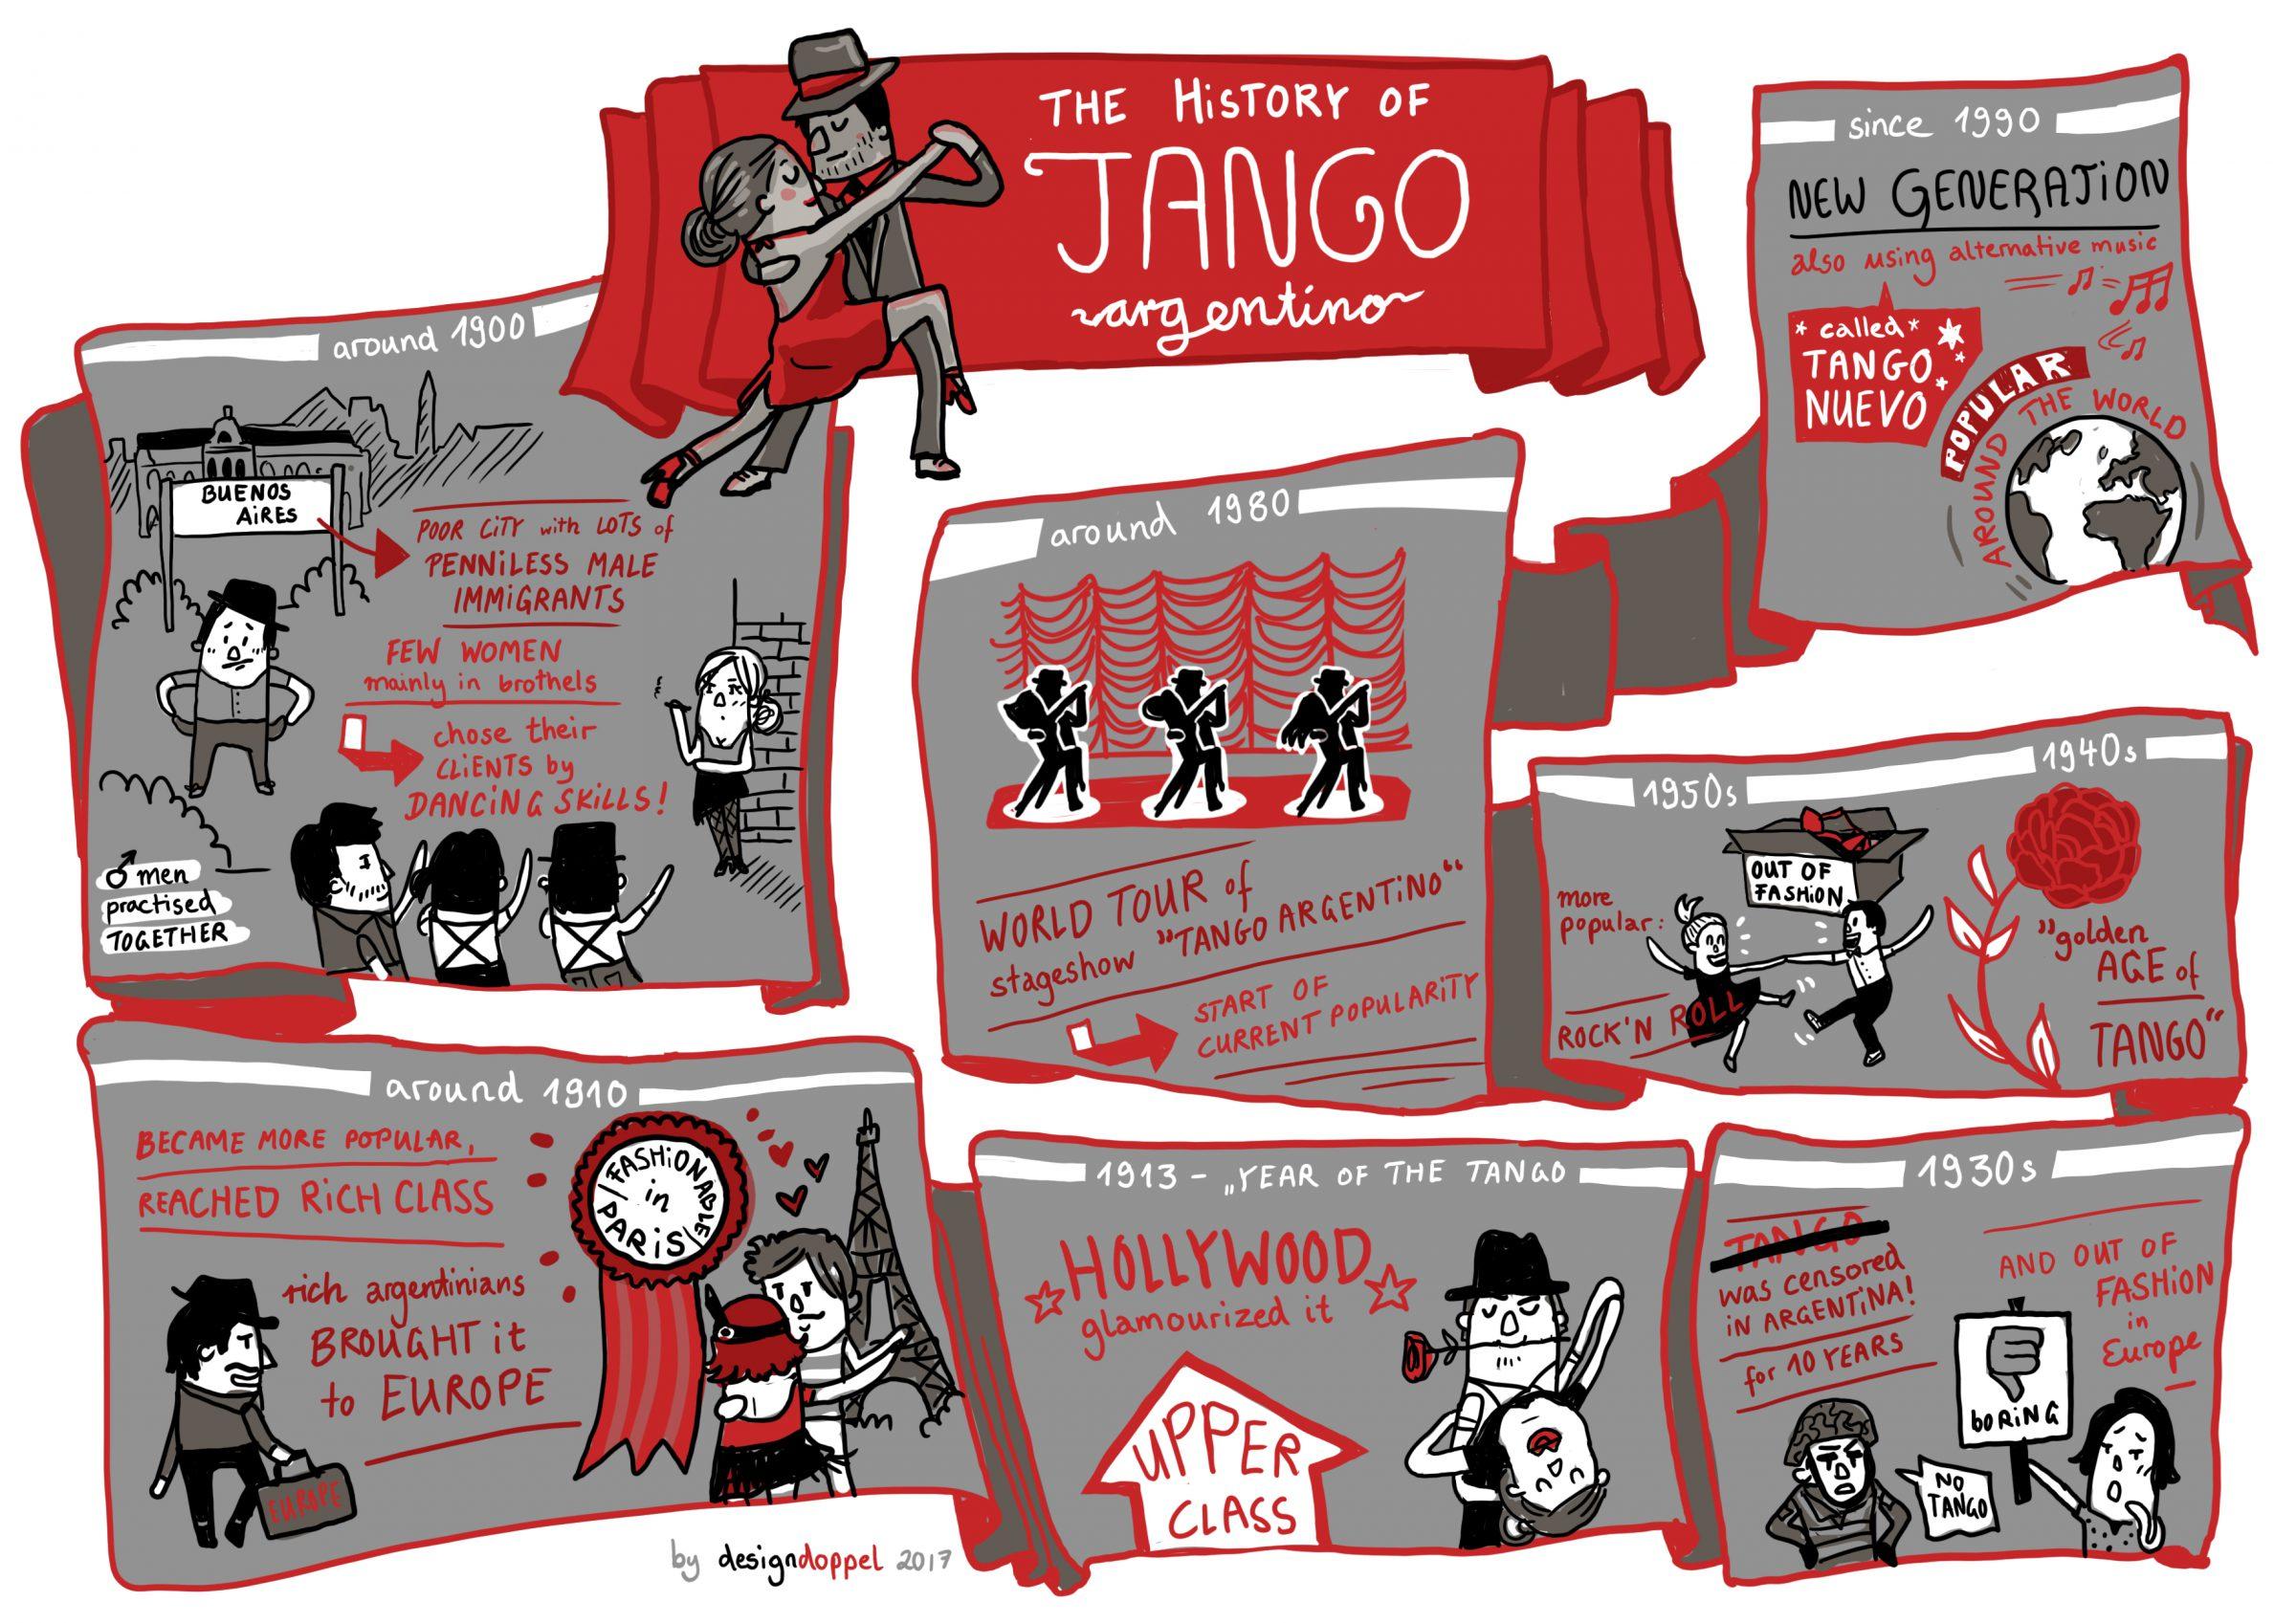 history of tango argentino designdoppel graphic recording